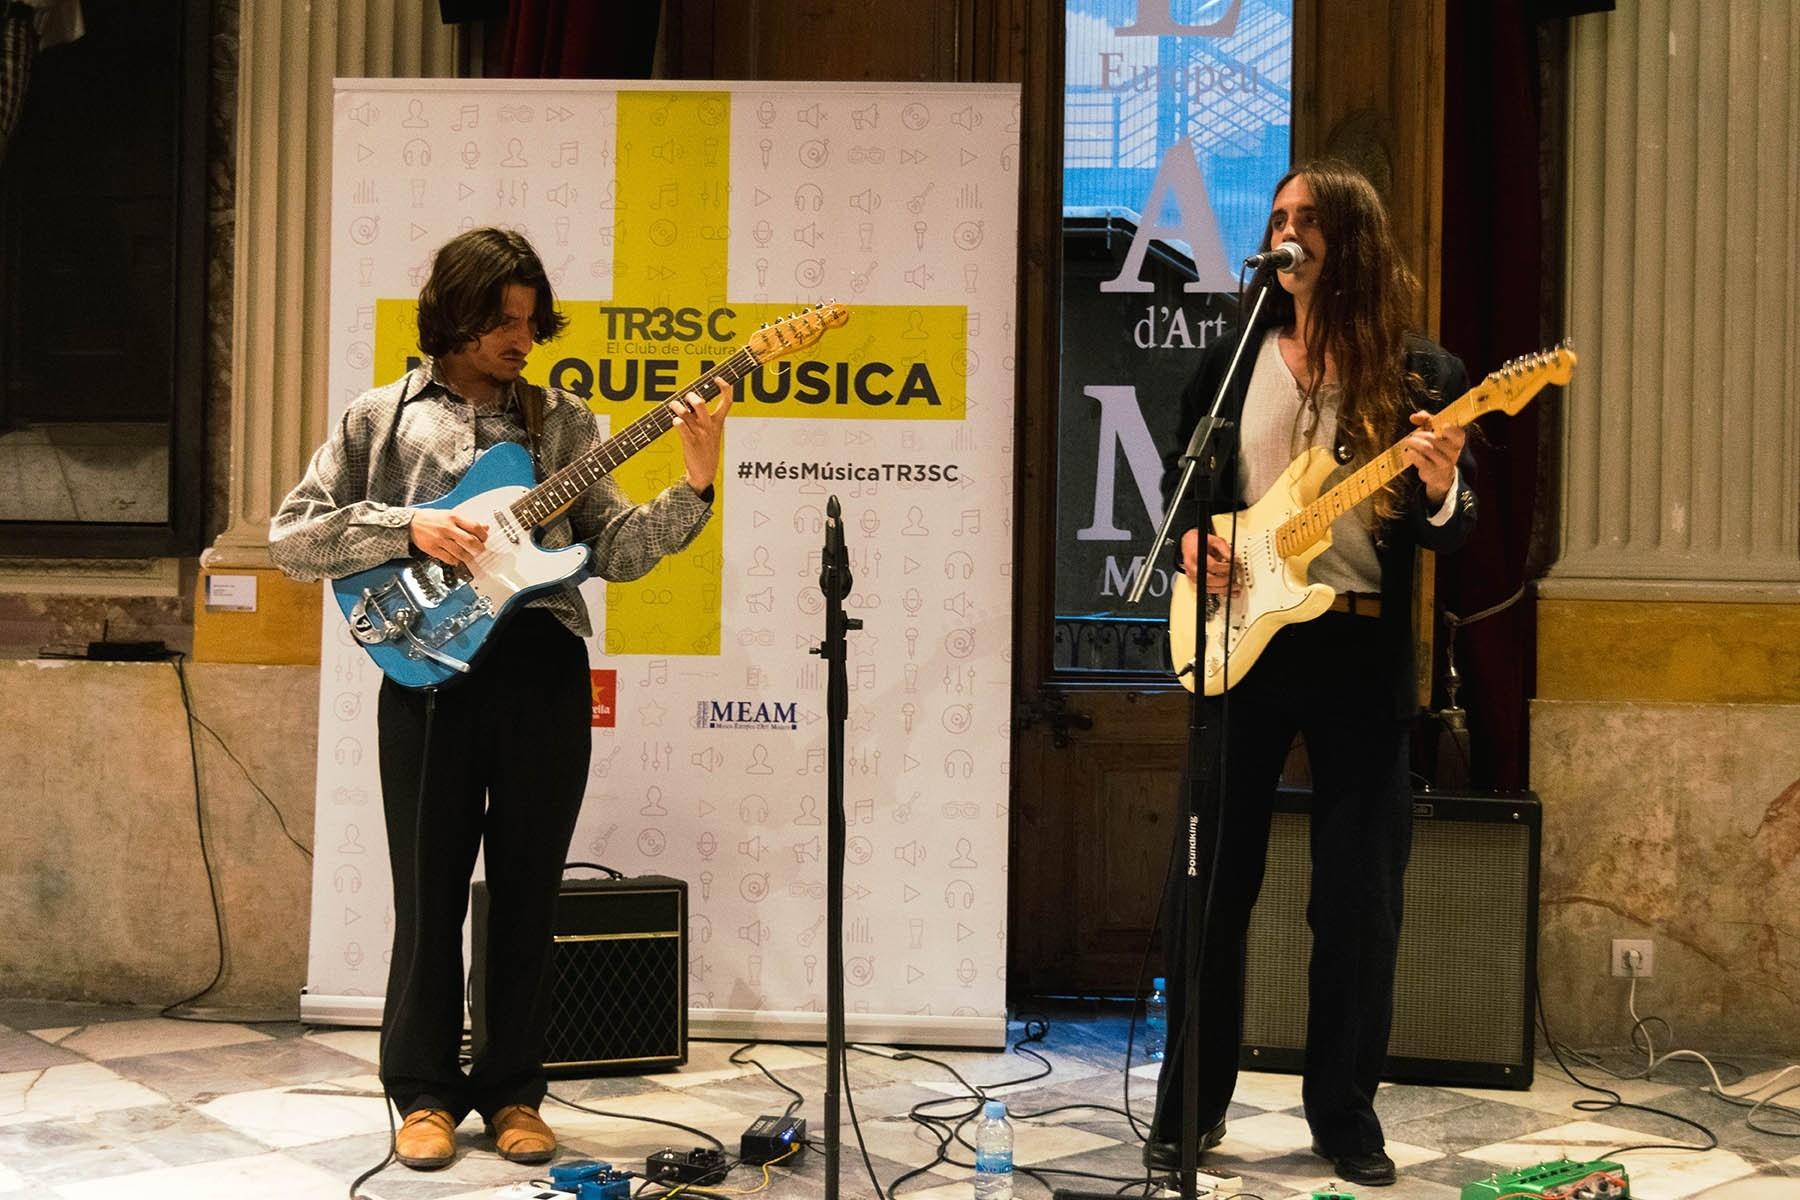 #MésQueMúsica amb Ljubliana & the Seawolf